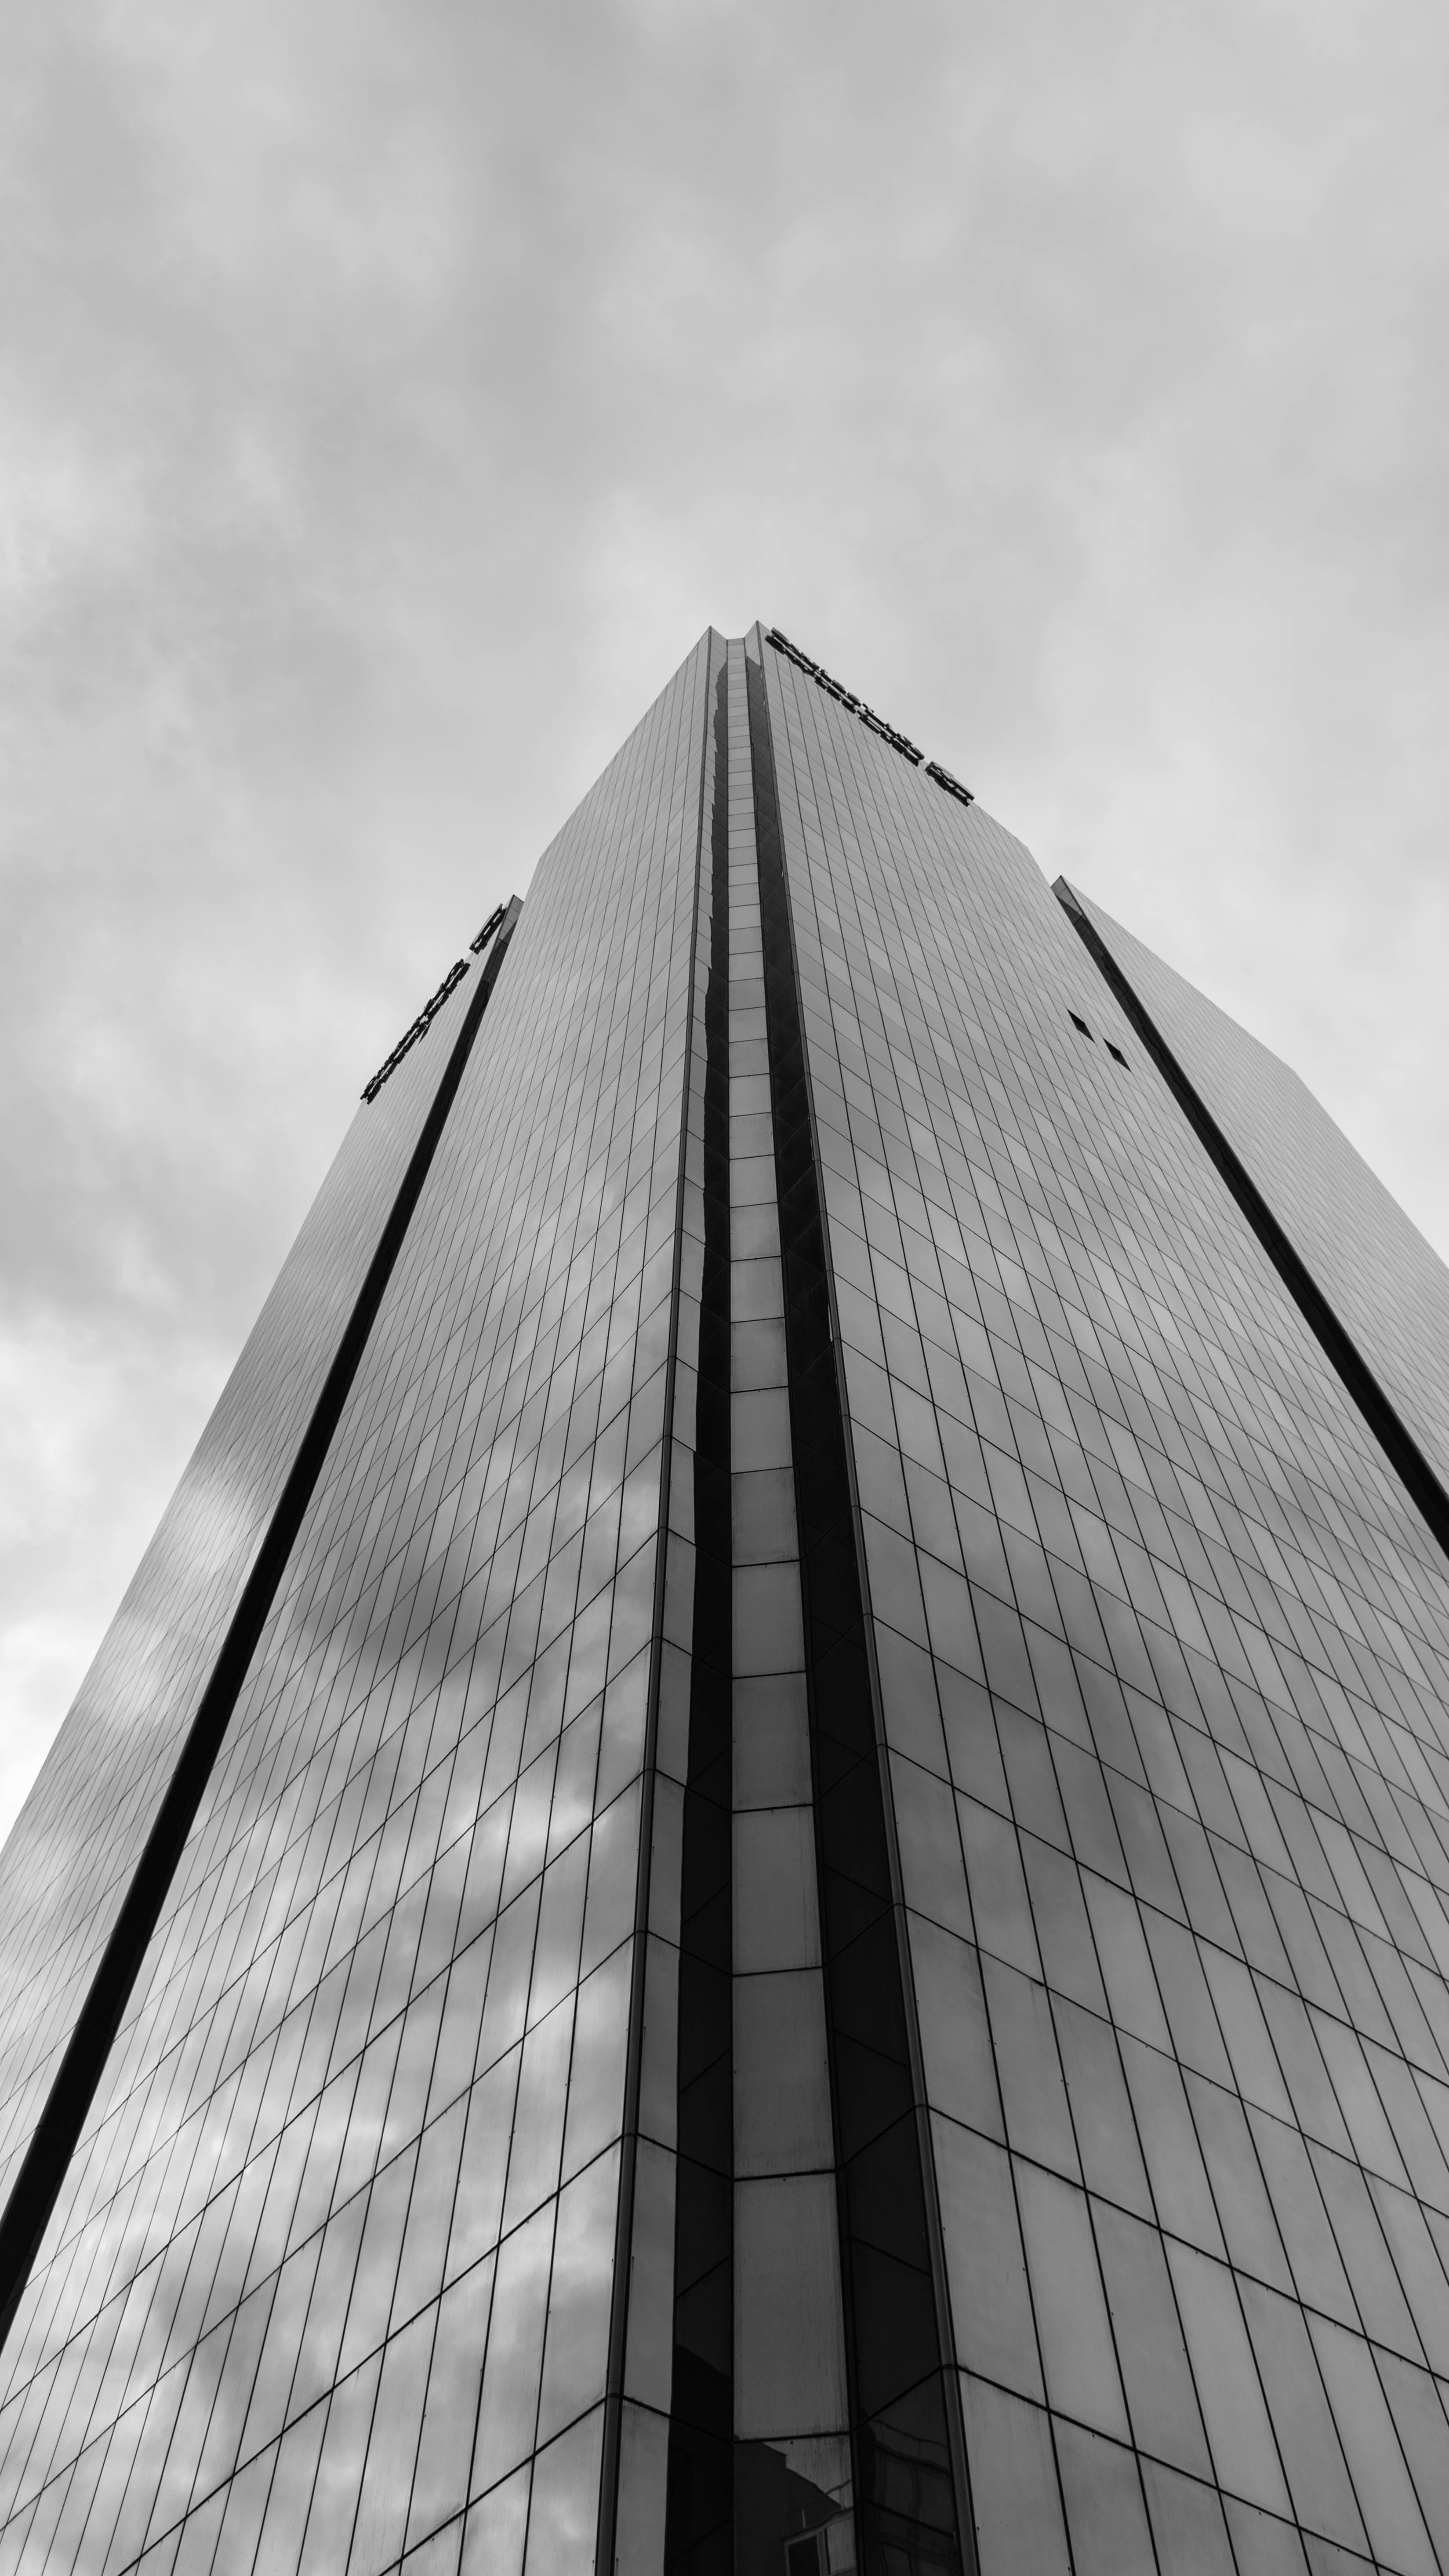 Free stock photo of blackandwhite, buildings, gratteciel, lyon